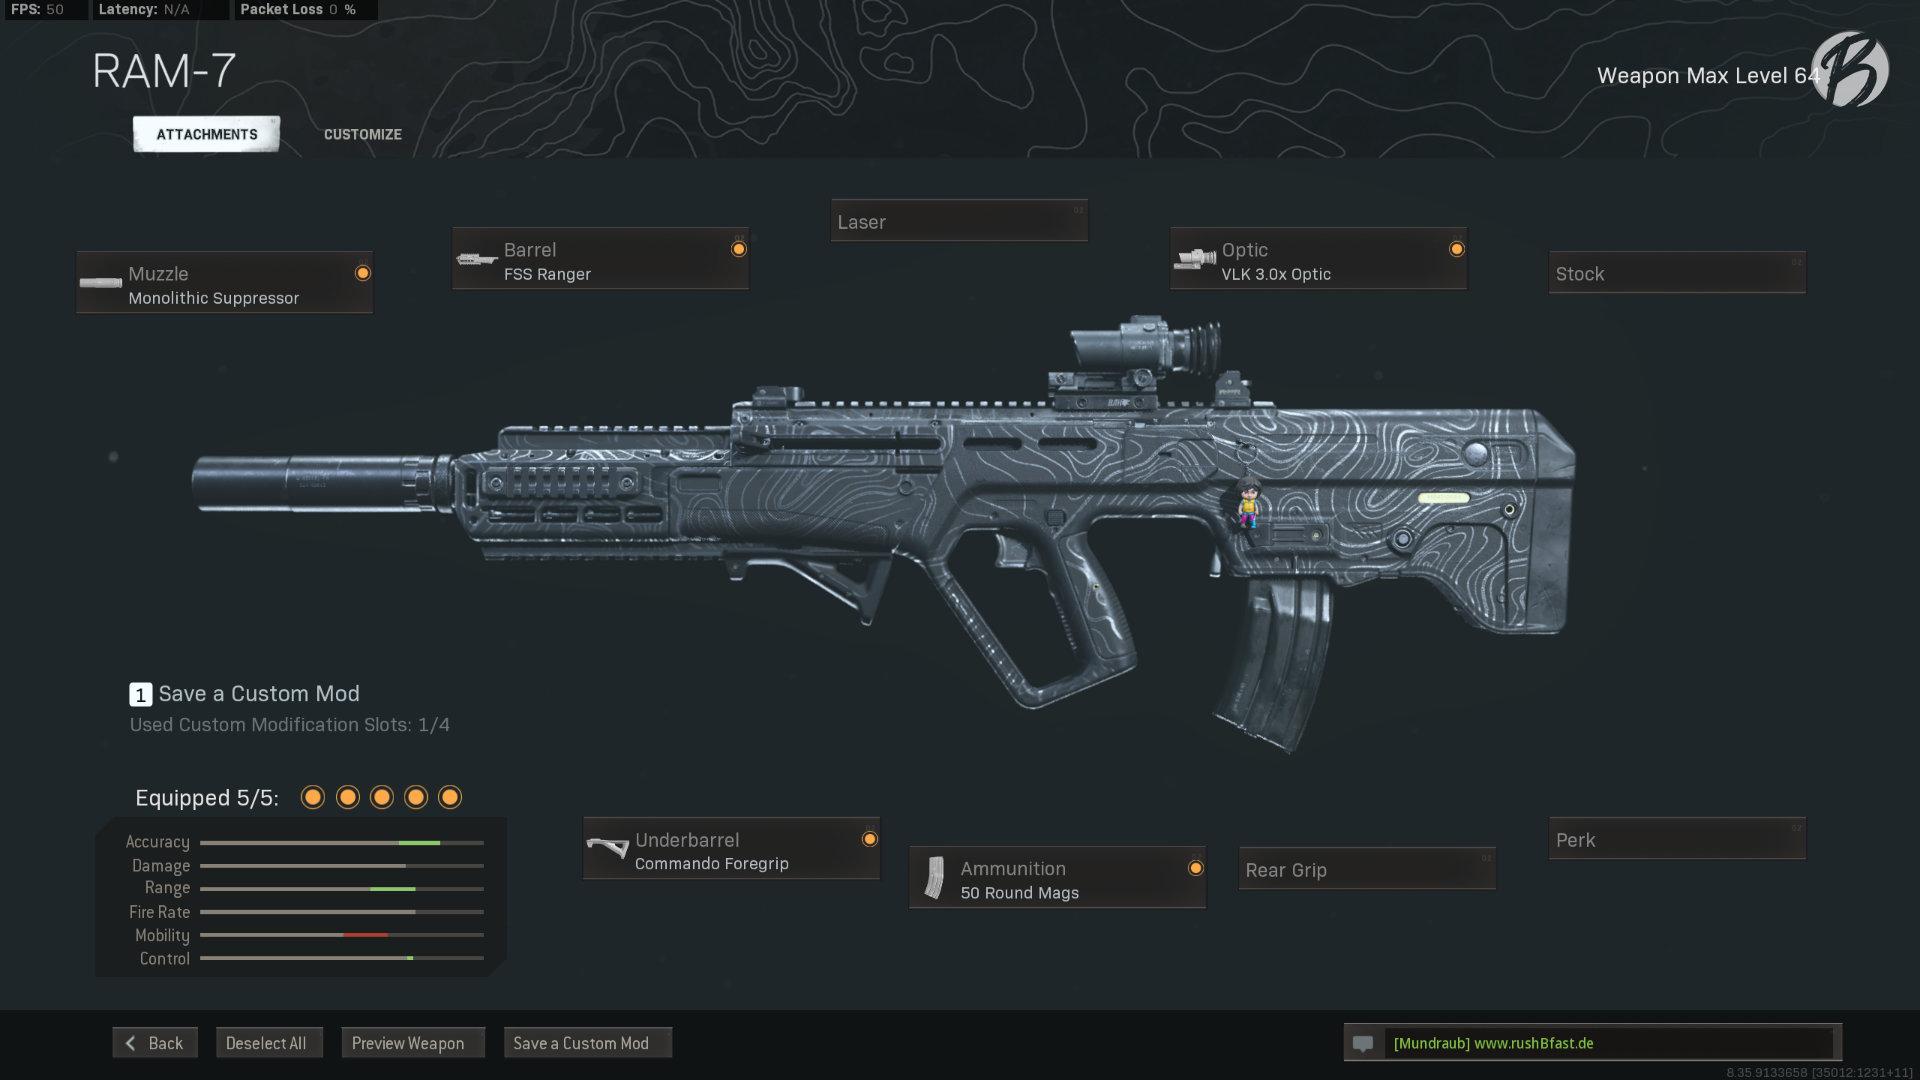 Call of Duty Warzone - Cold War Season 3 - Ram-7